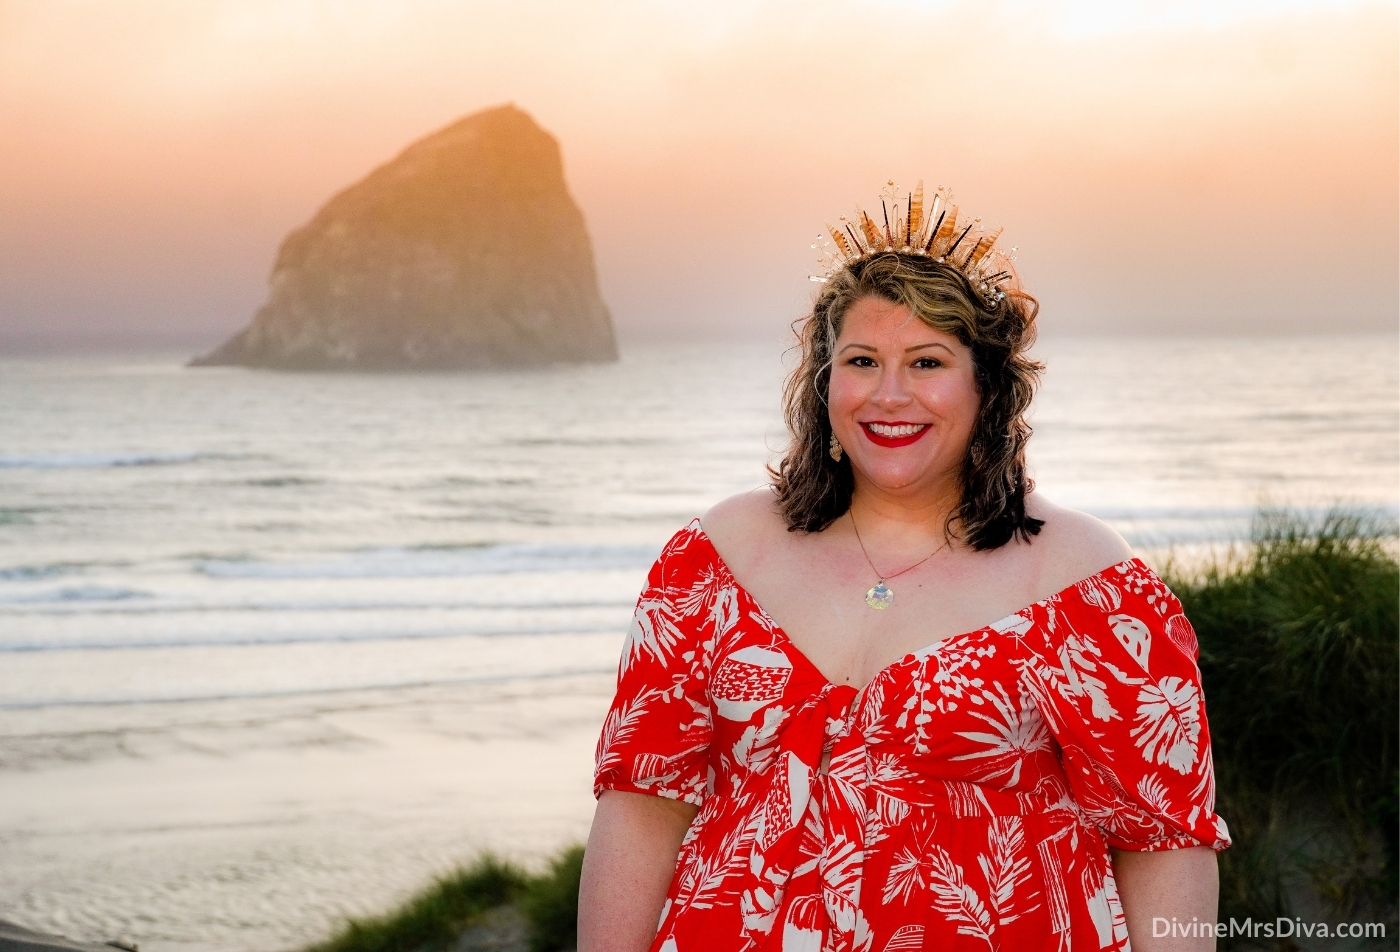 Birthday Beach Photoshoot + DIY Seashell Tiara Reveal!